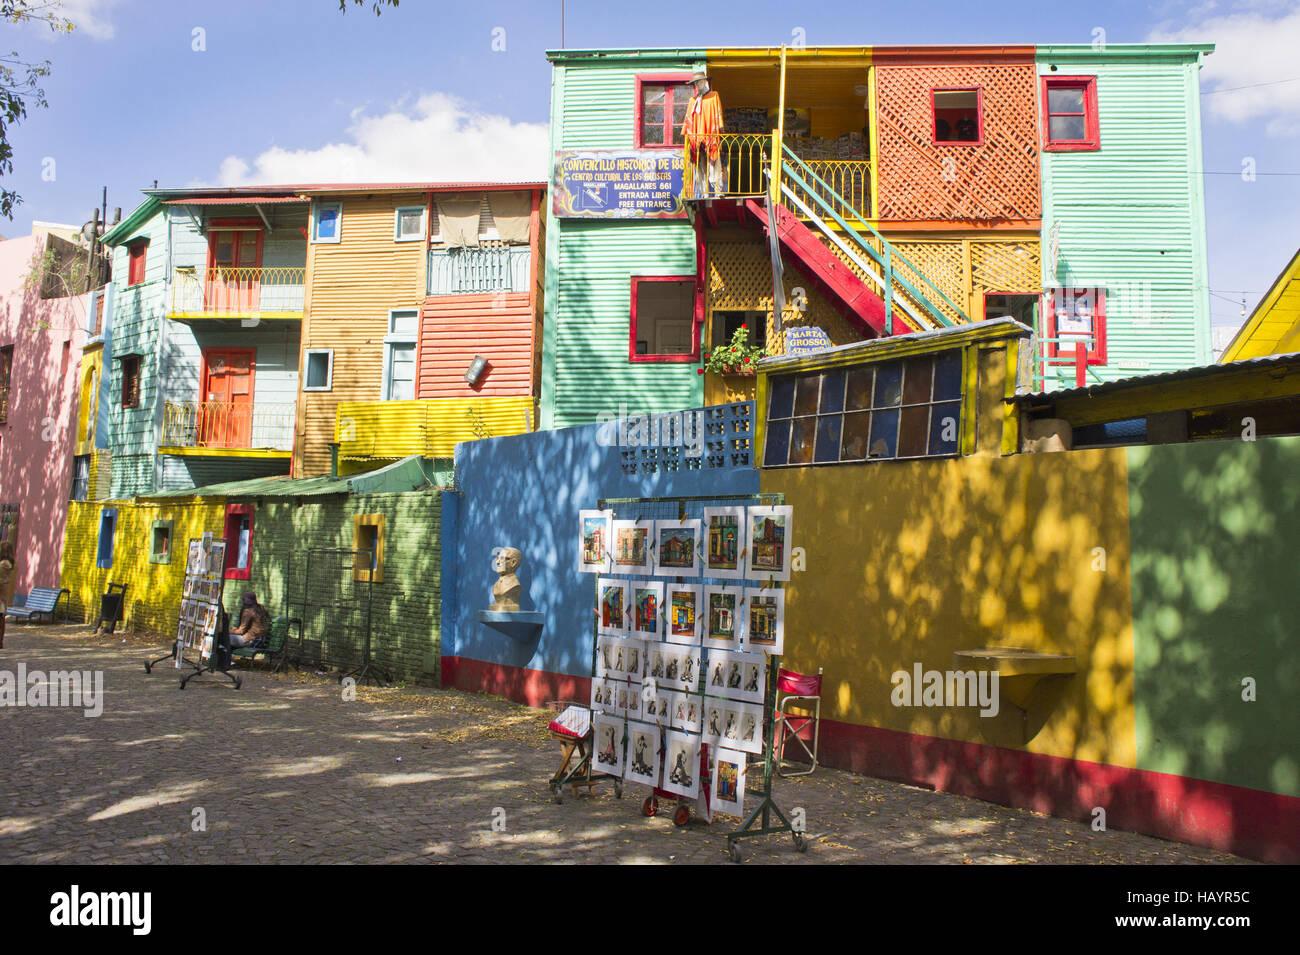 Argentina, Buenos Aires, La Boca - Stock Image